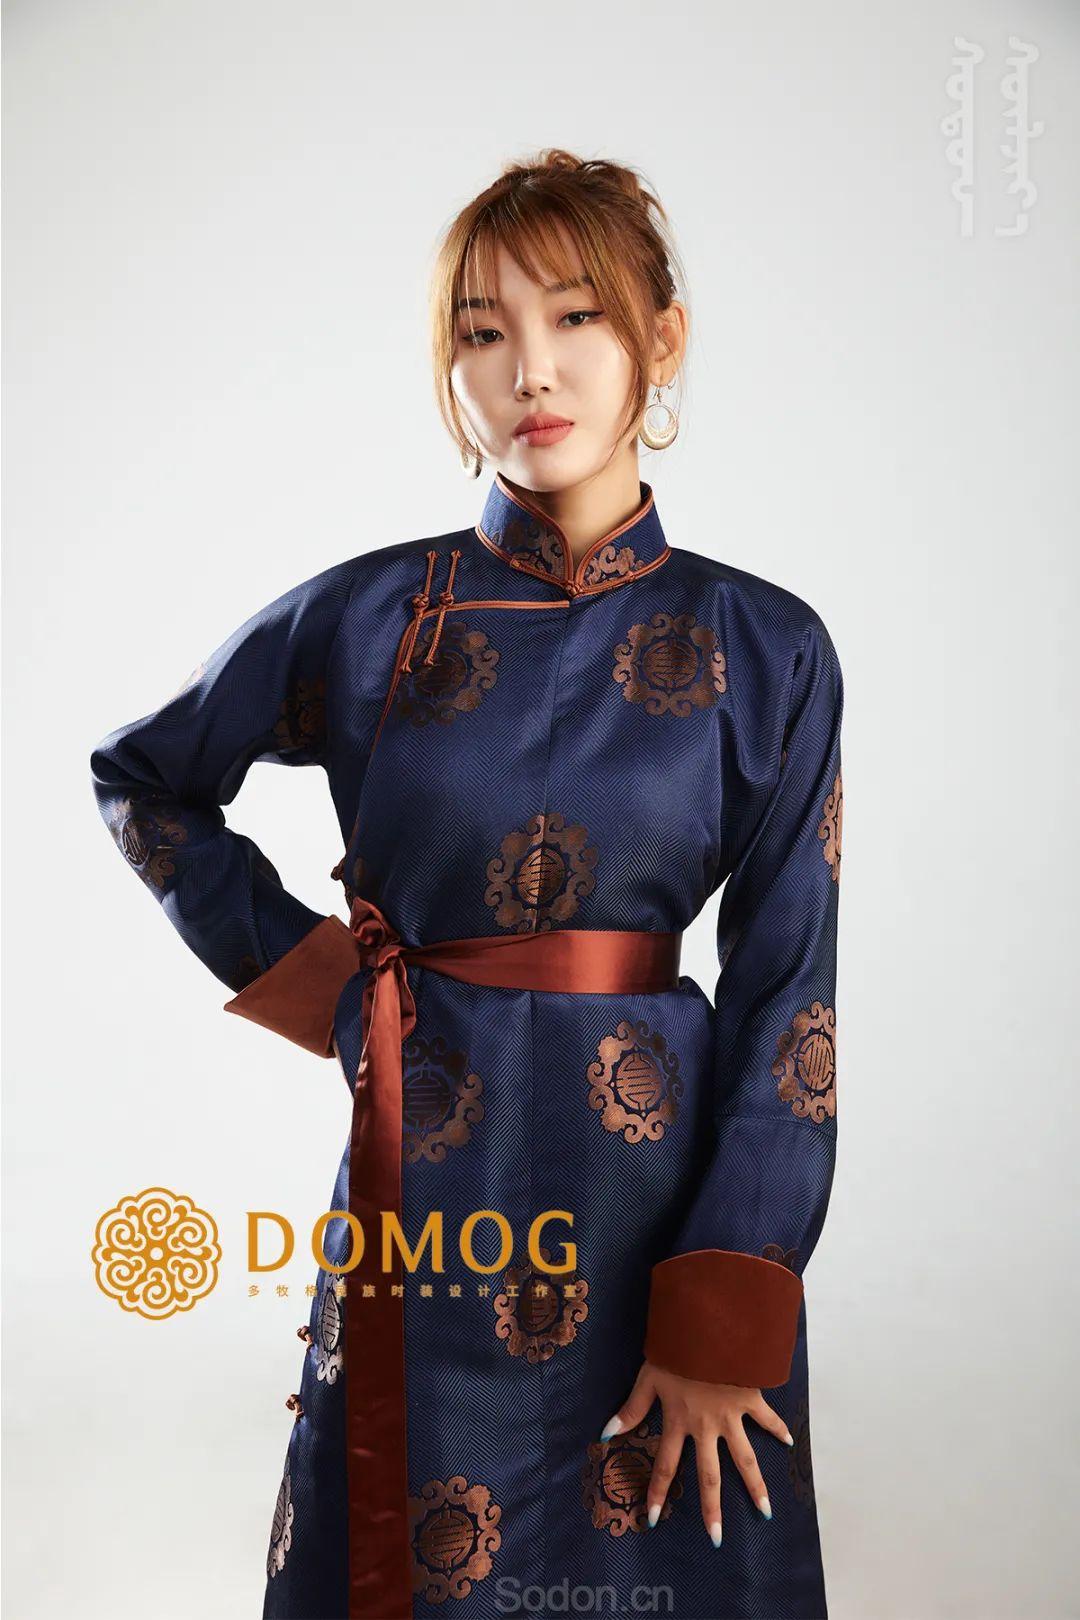 DOMOG 蒙古时装2020新款,民族与时尚的融合